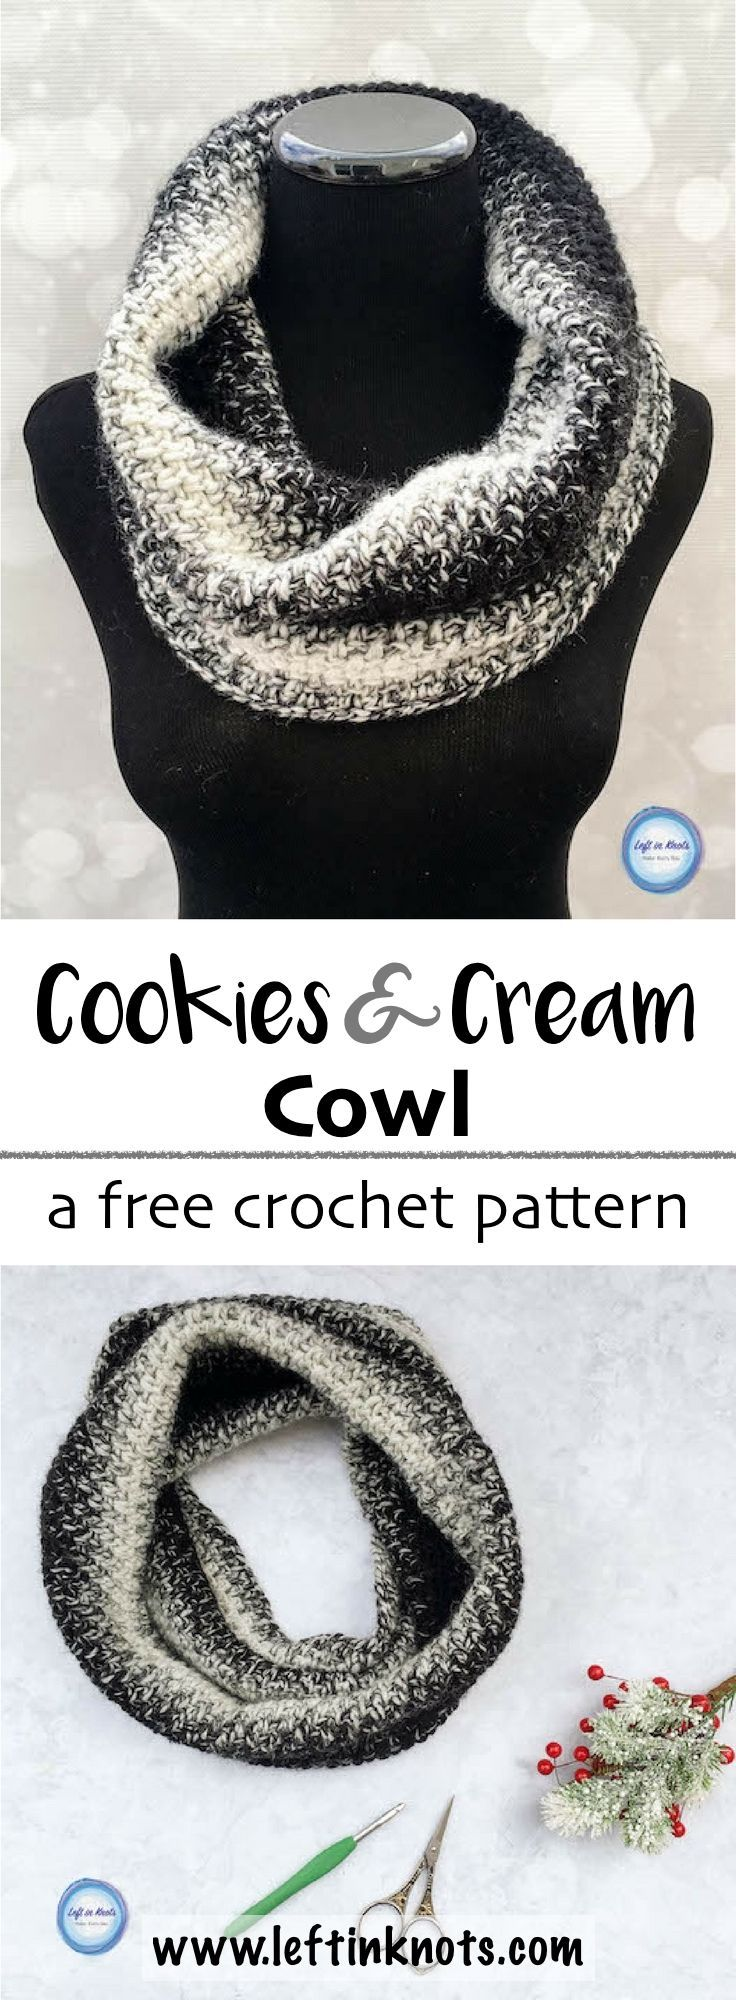 Cookies and Cream Cowl Crochet Pattern | Tejido, Dos agujas y Gorros